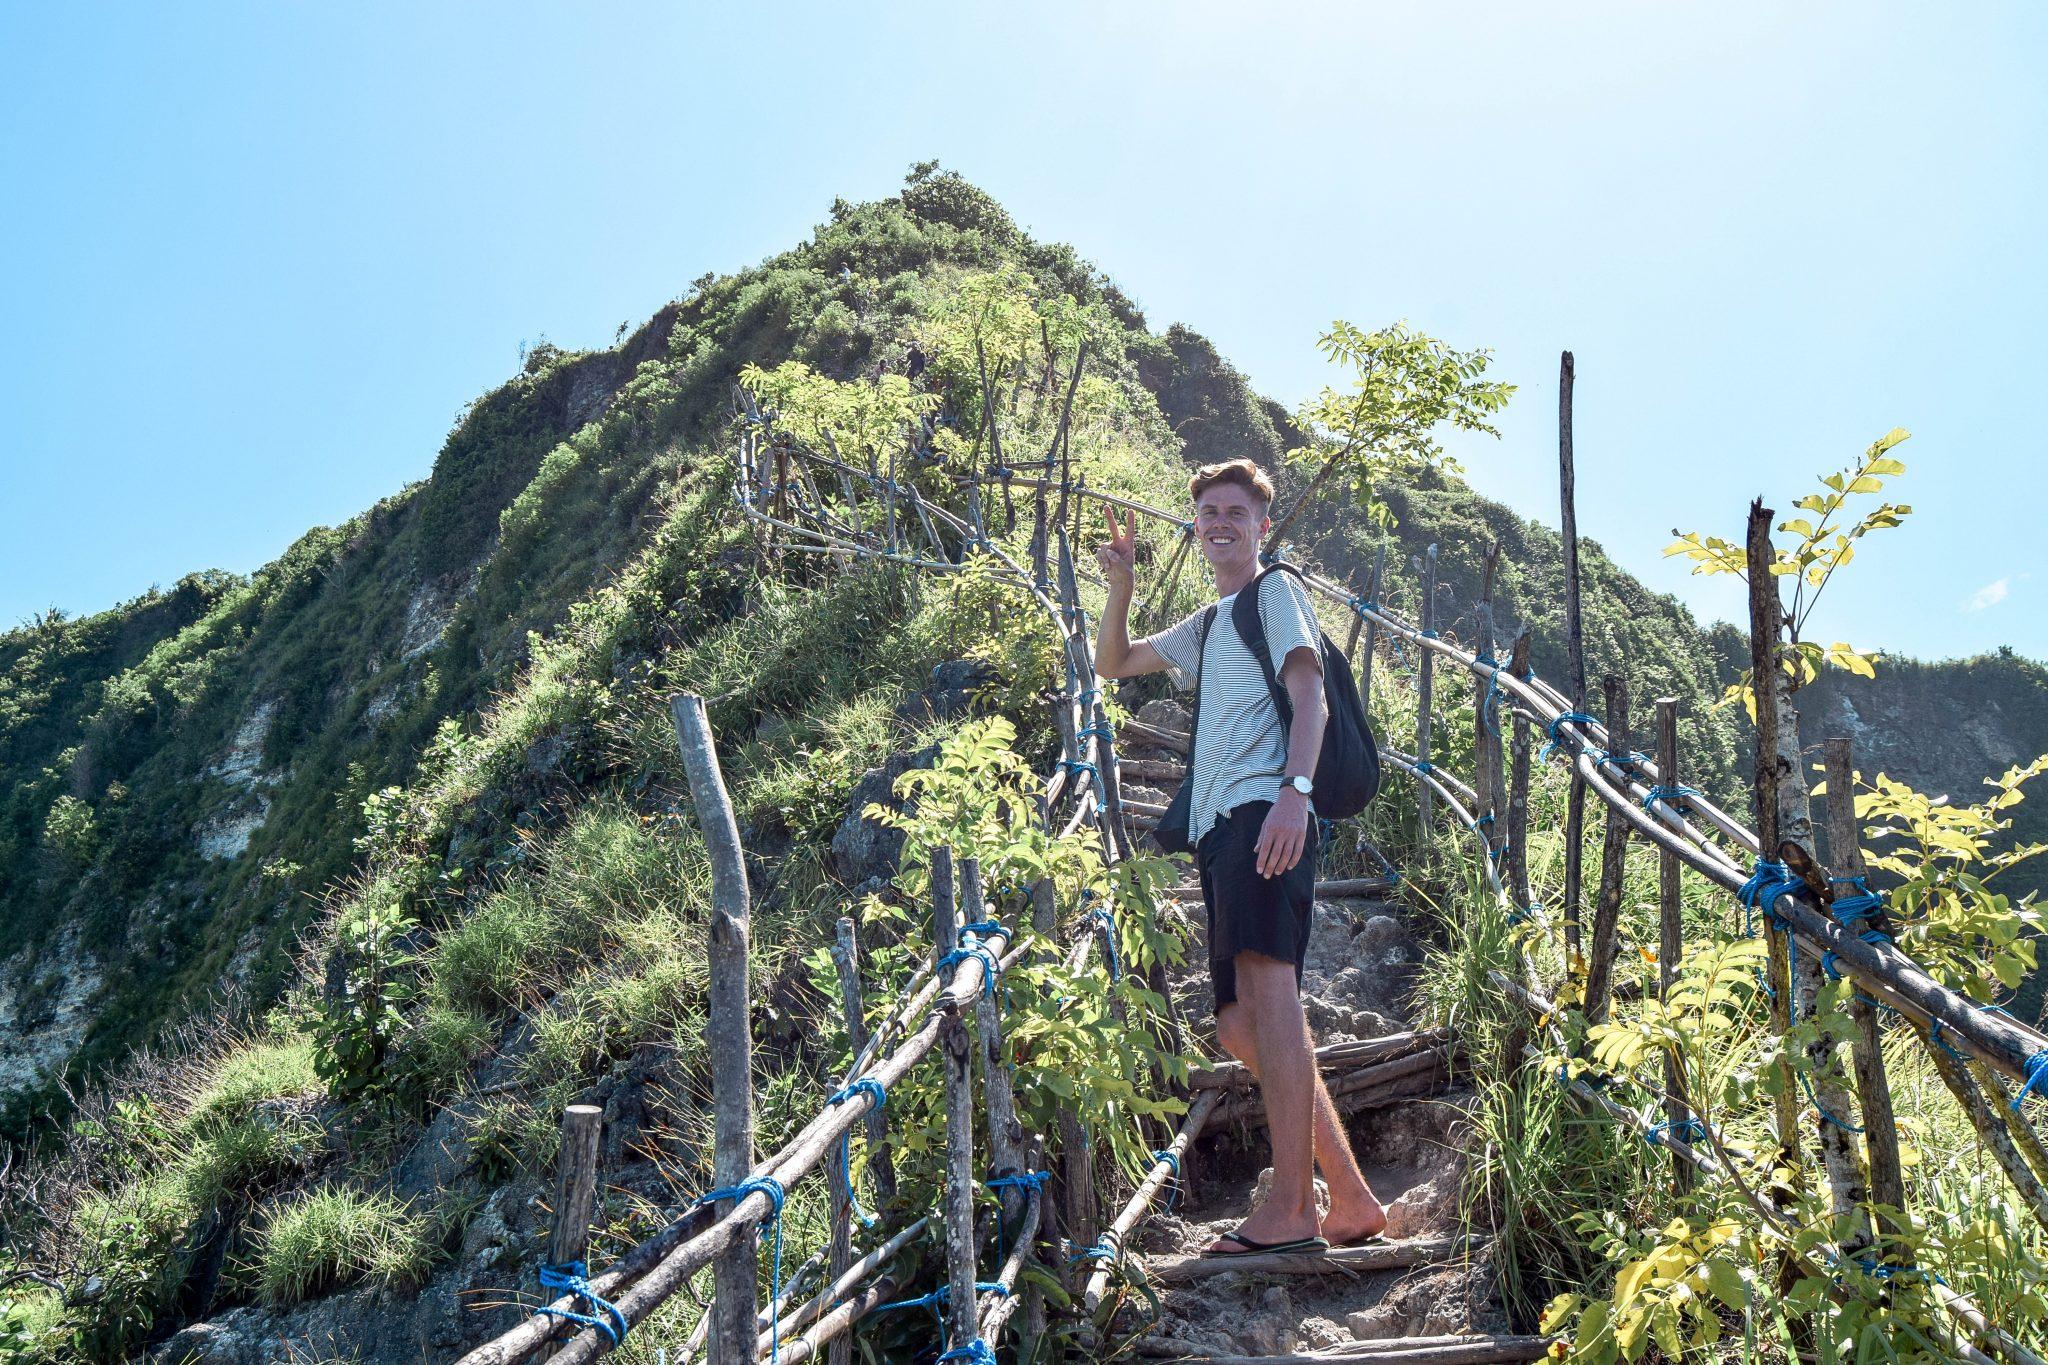 Wanderers & Warriors - Charlie & Lauren UK Travel Couple - The Walk Down To Kelingking Beach - Nusa Penida Bali